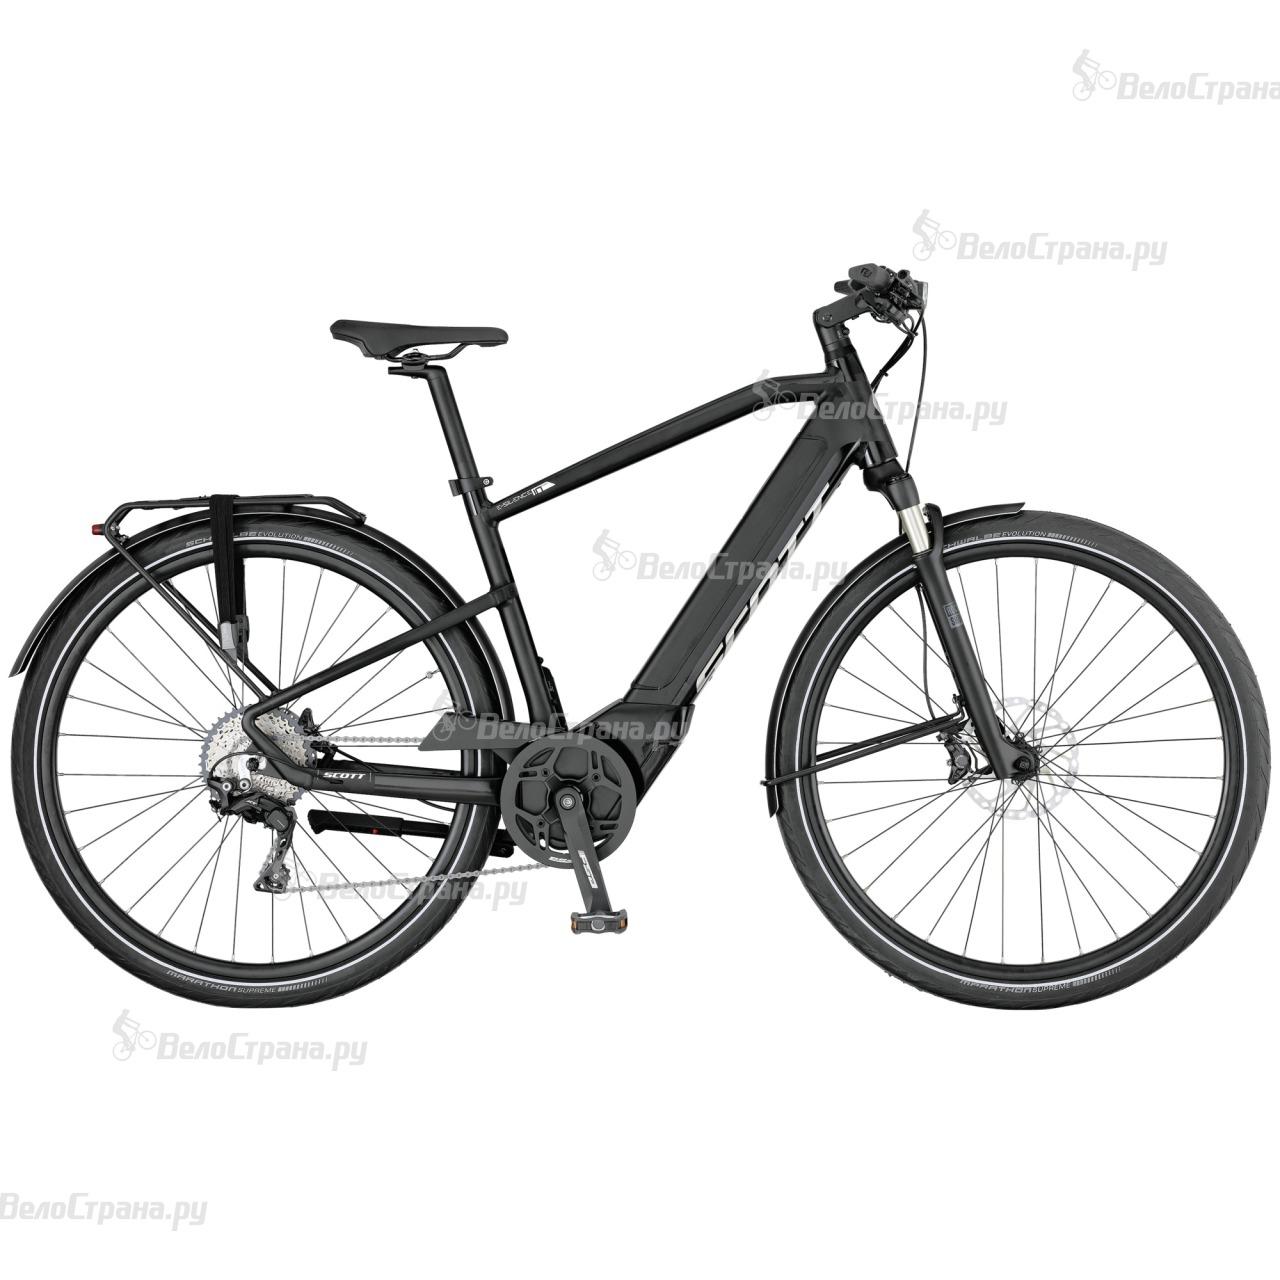 Велосипед Scott E-Silence 10 (2017) велосипед scott e silence speed 20 2017